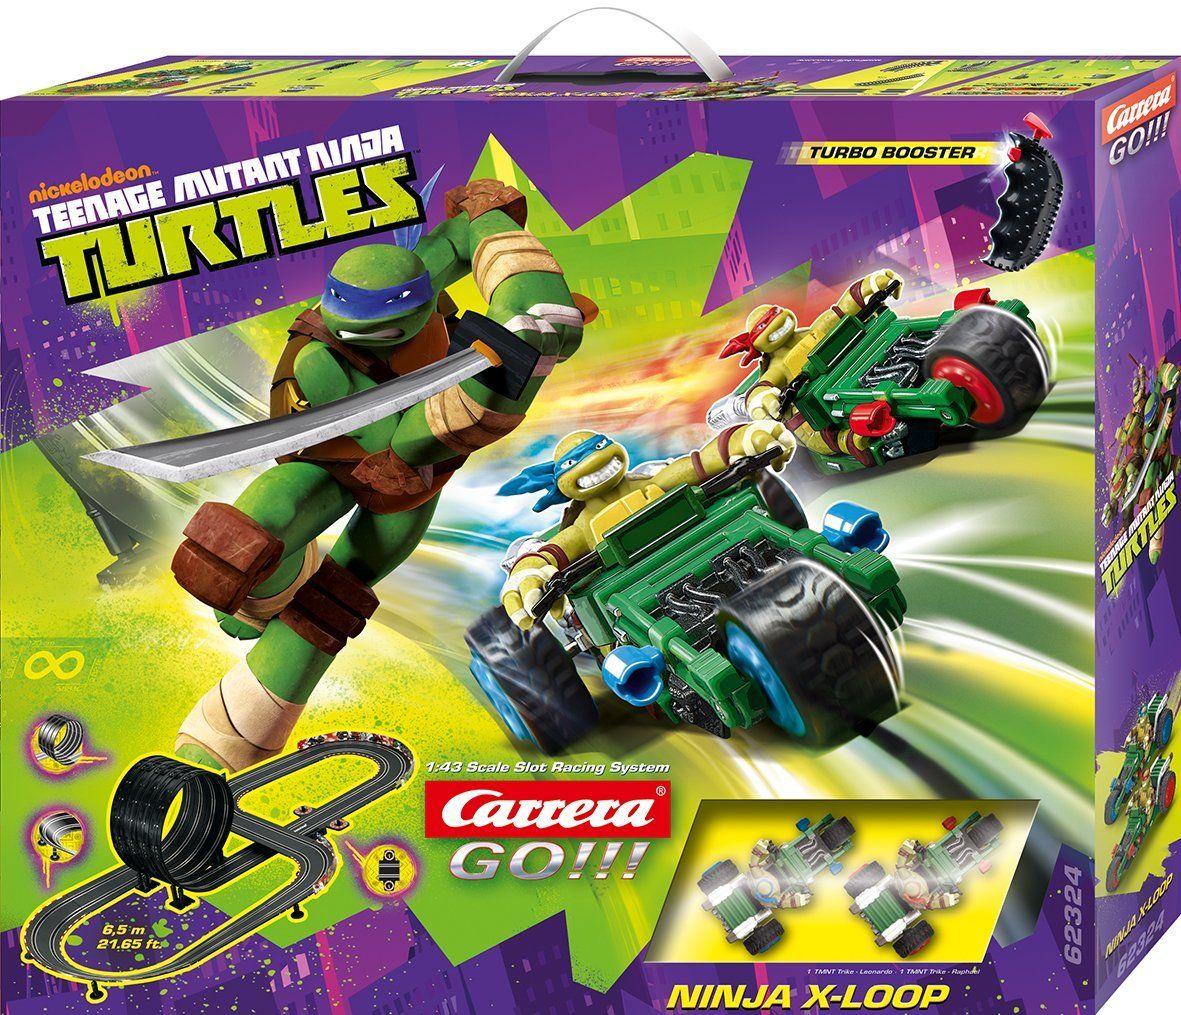 Carrera Slot 1 43 Go Teenage Mutant Ninja Turtles Ninja X Loop 62324 Manufacturer Carrera Barcode 4 Ninja Turtles Turtle Teenage Mutant Ninja Turtles